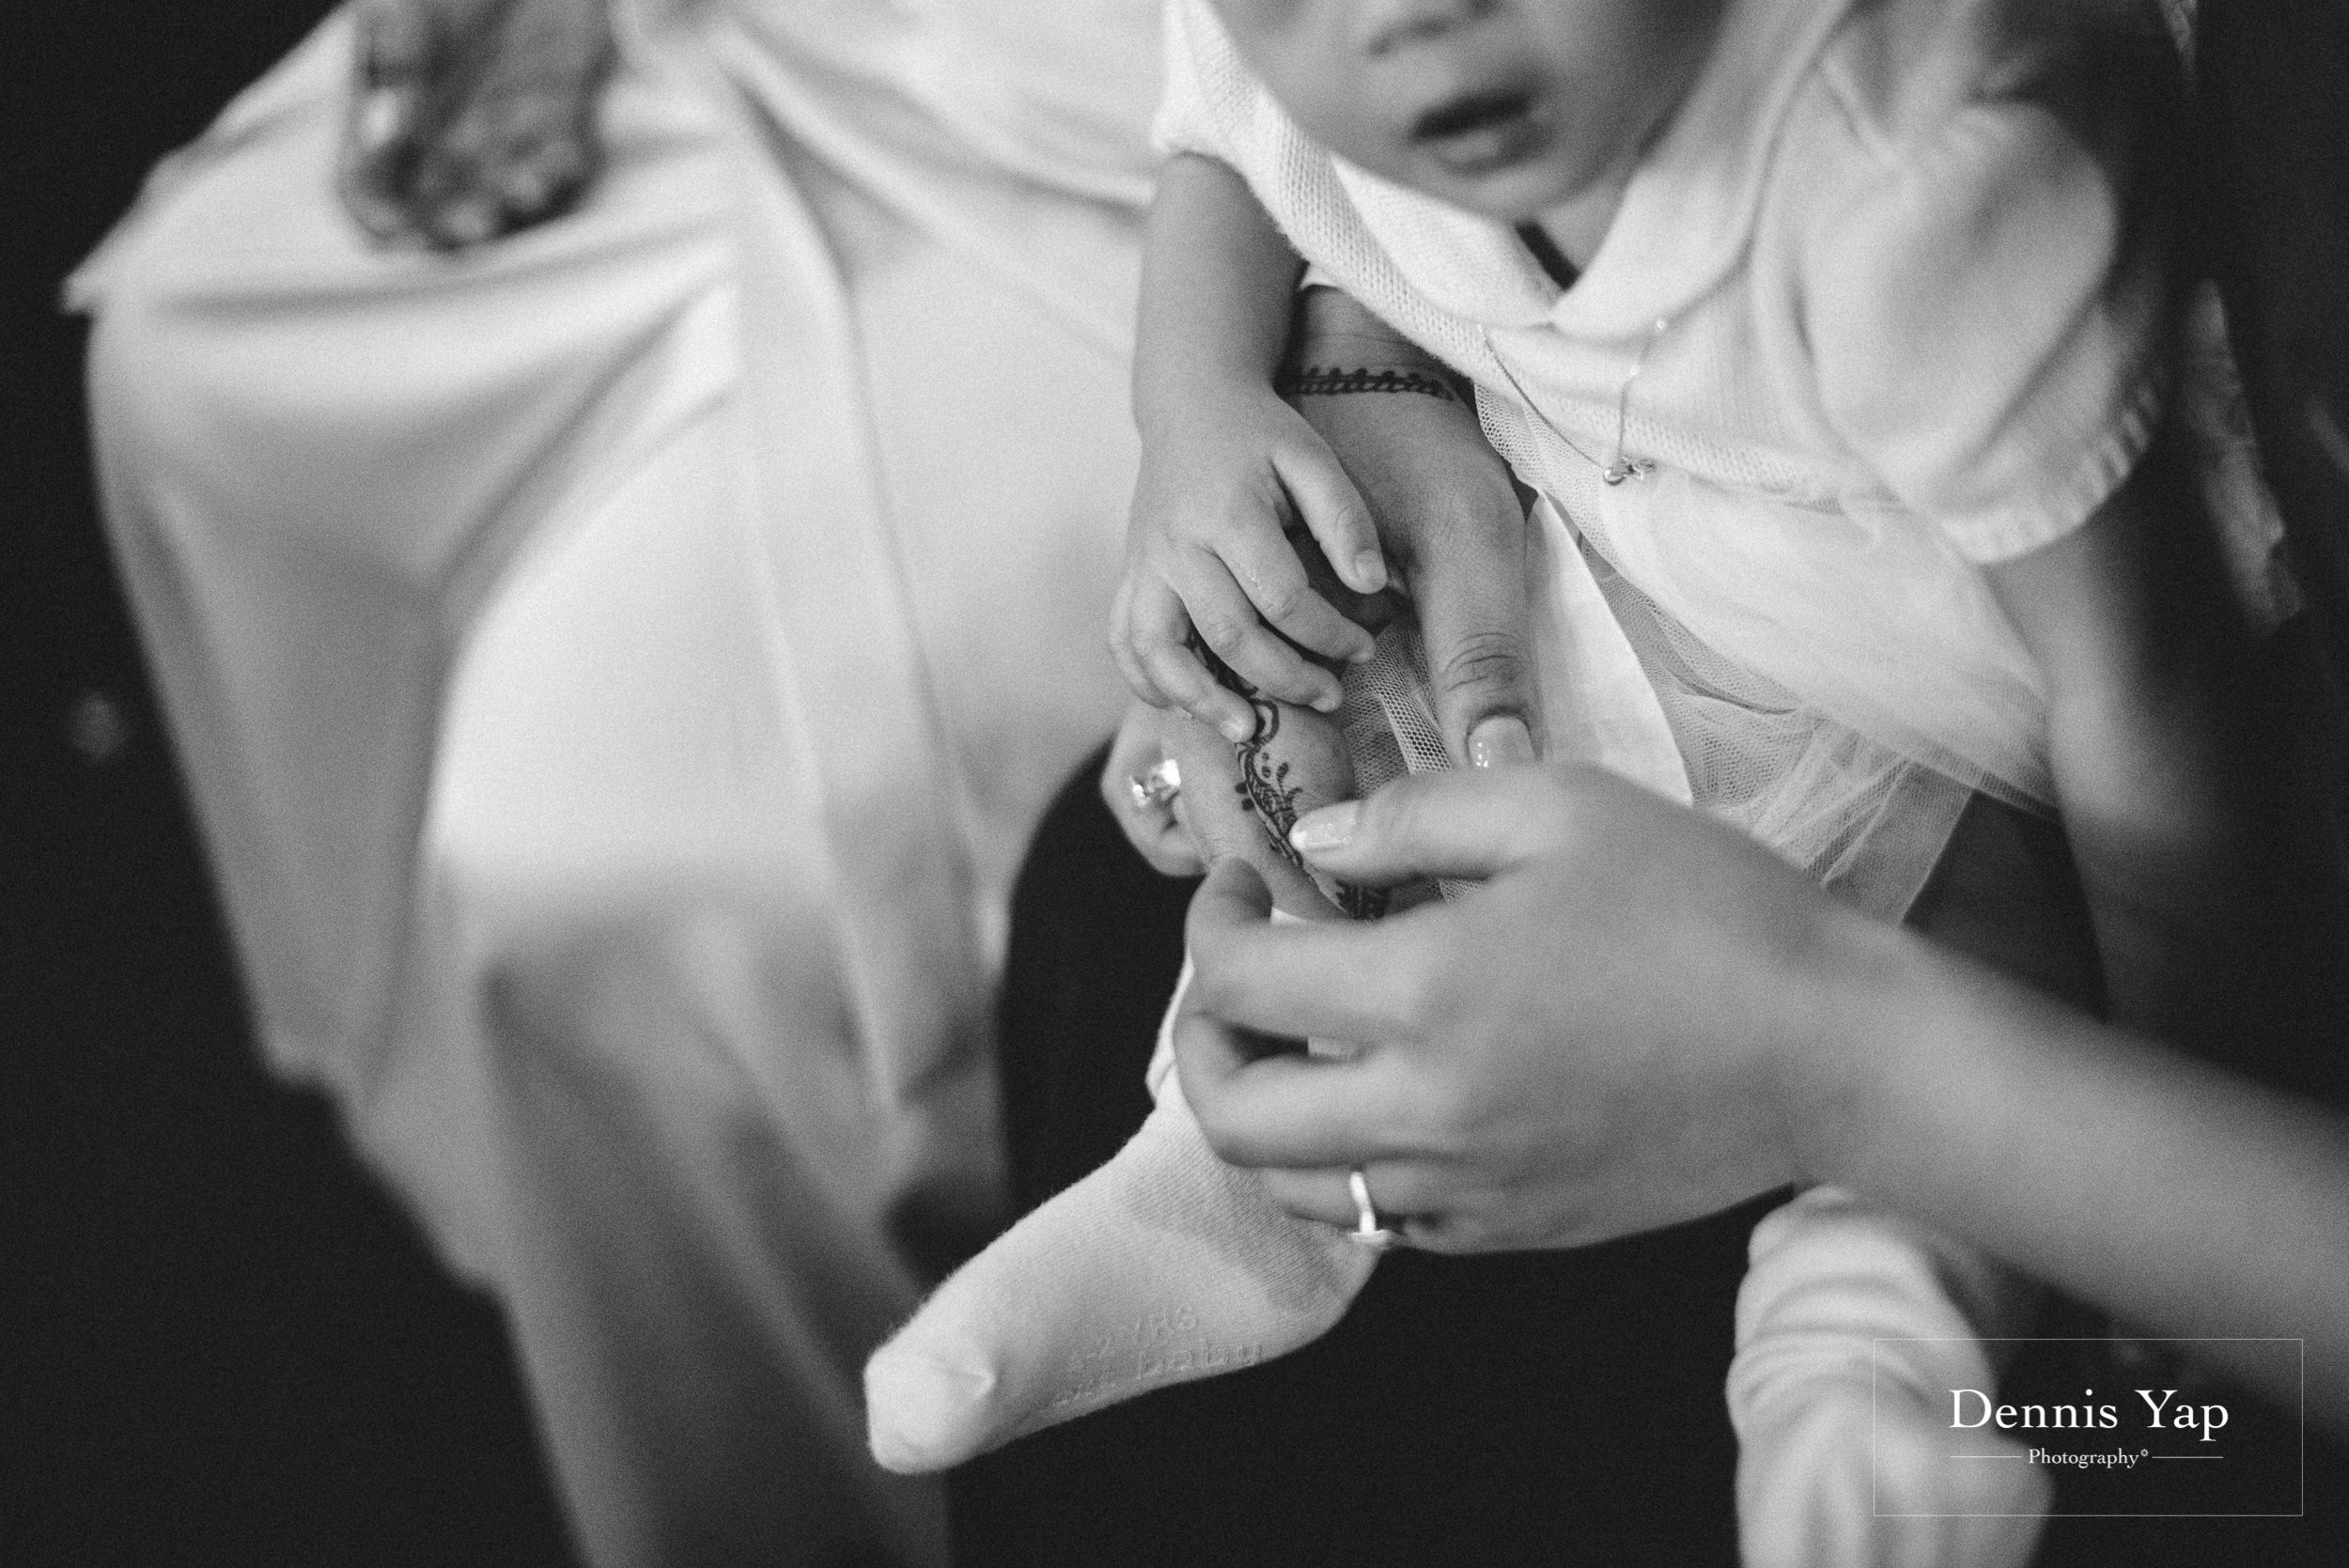 zarif hanalili malay wedding ceremony dennis yap photography-2.jpg